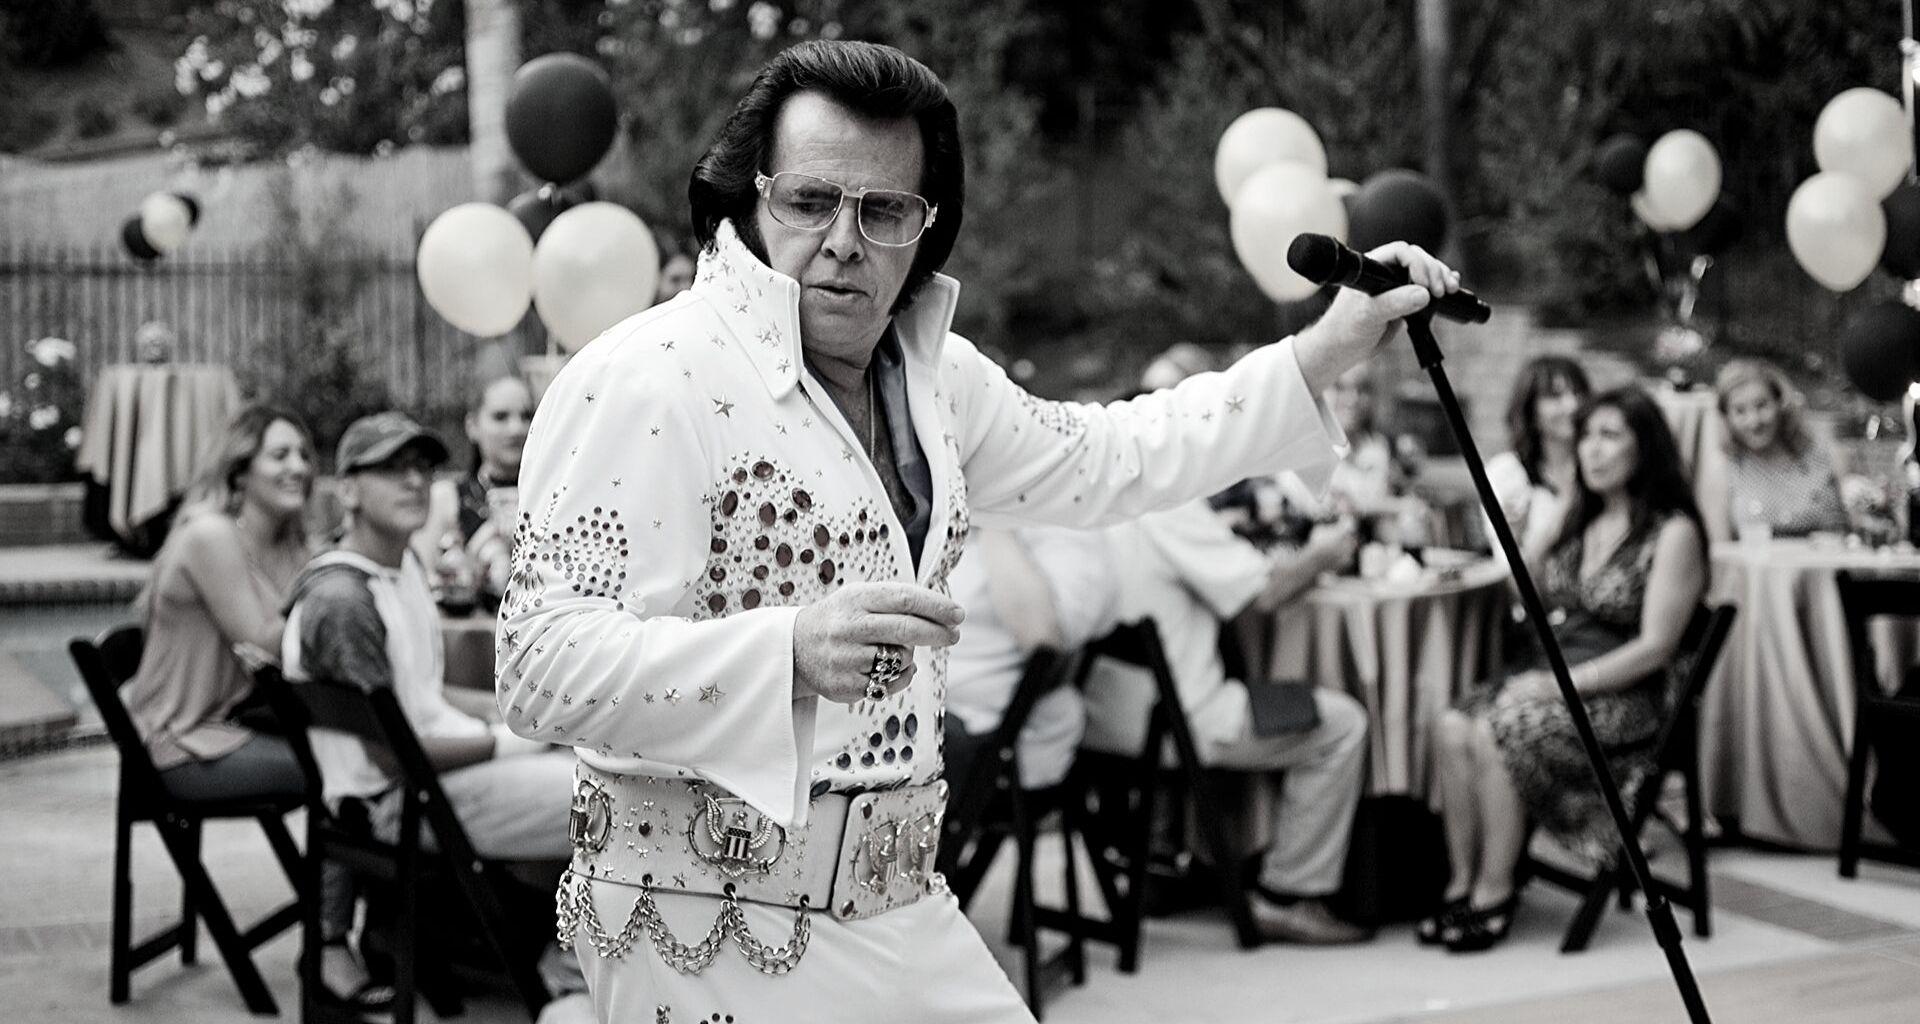 Top Event - Elvis Dinnershows